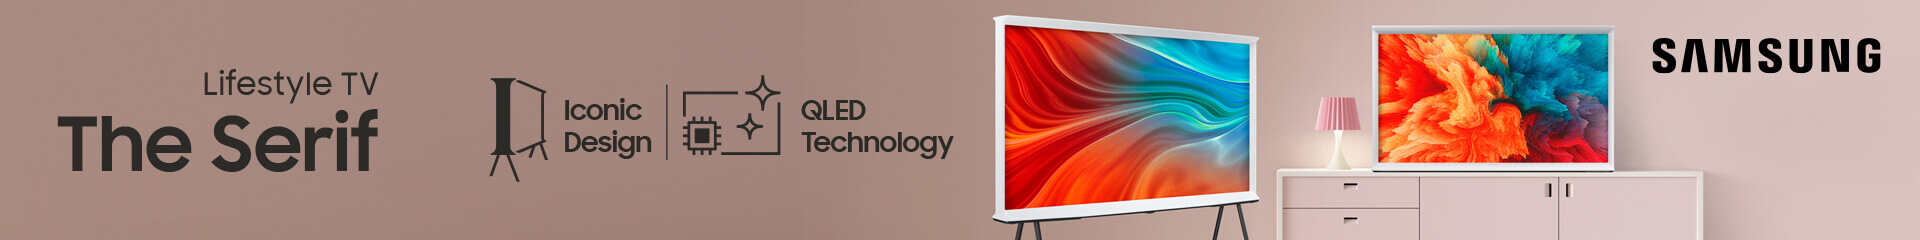 The Serif a Lifestyle TV | Samsung